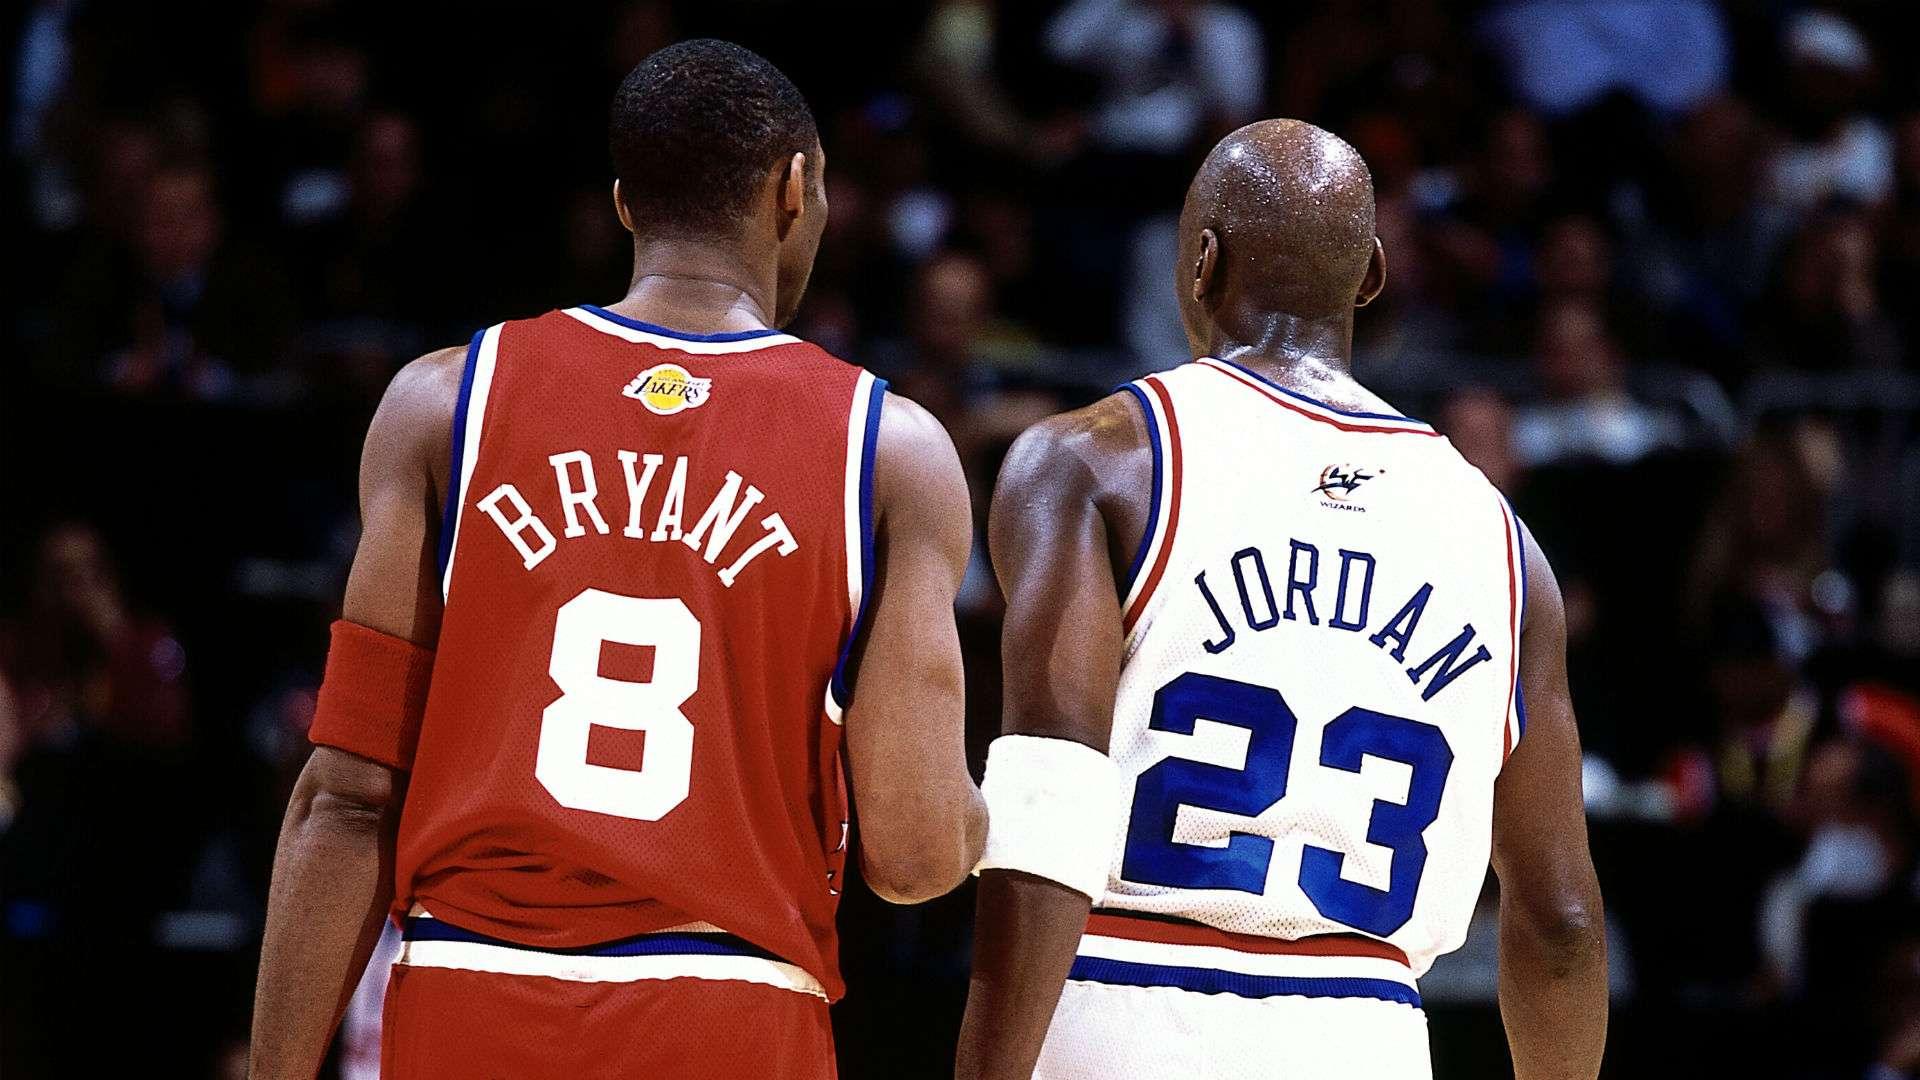 'The Last Dance': Kobe Bryant y la dedicatoria especial a Michael Jordan